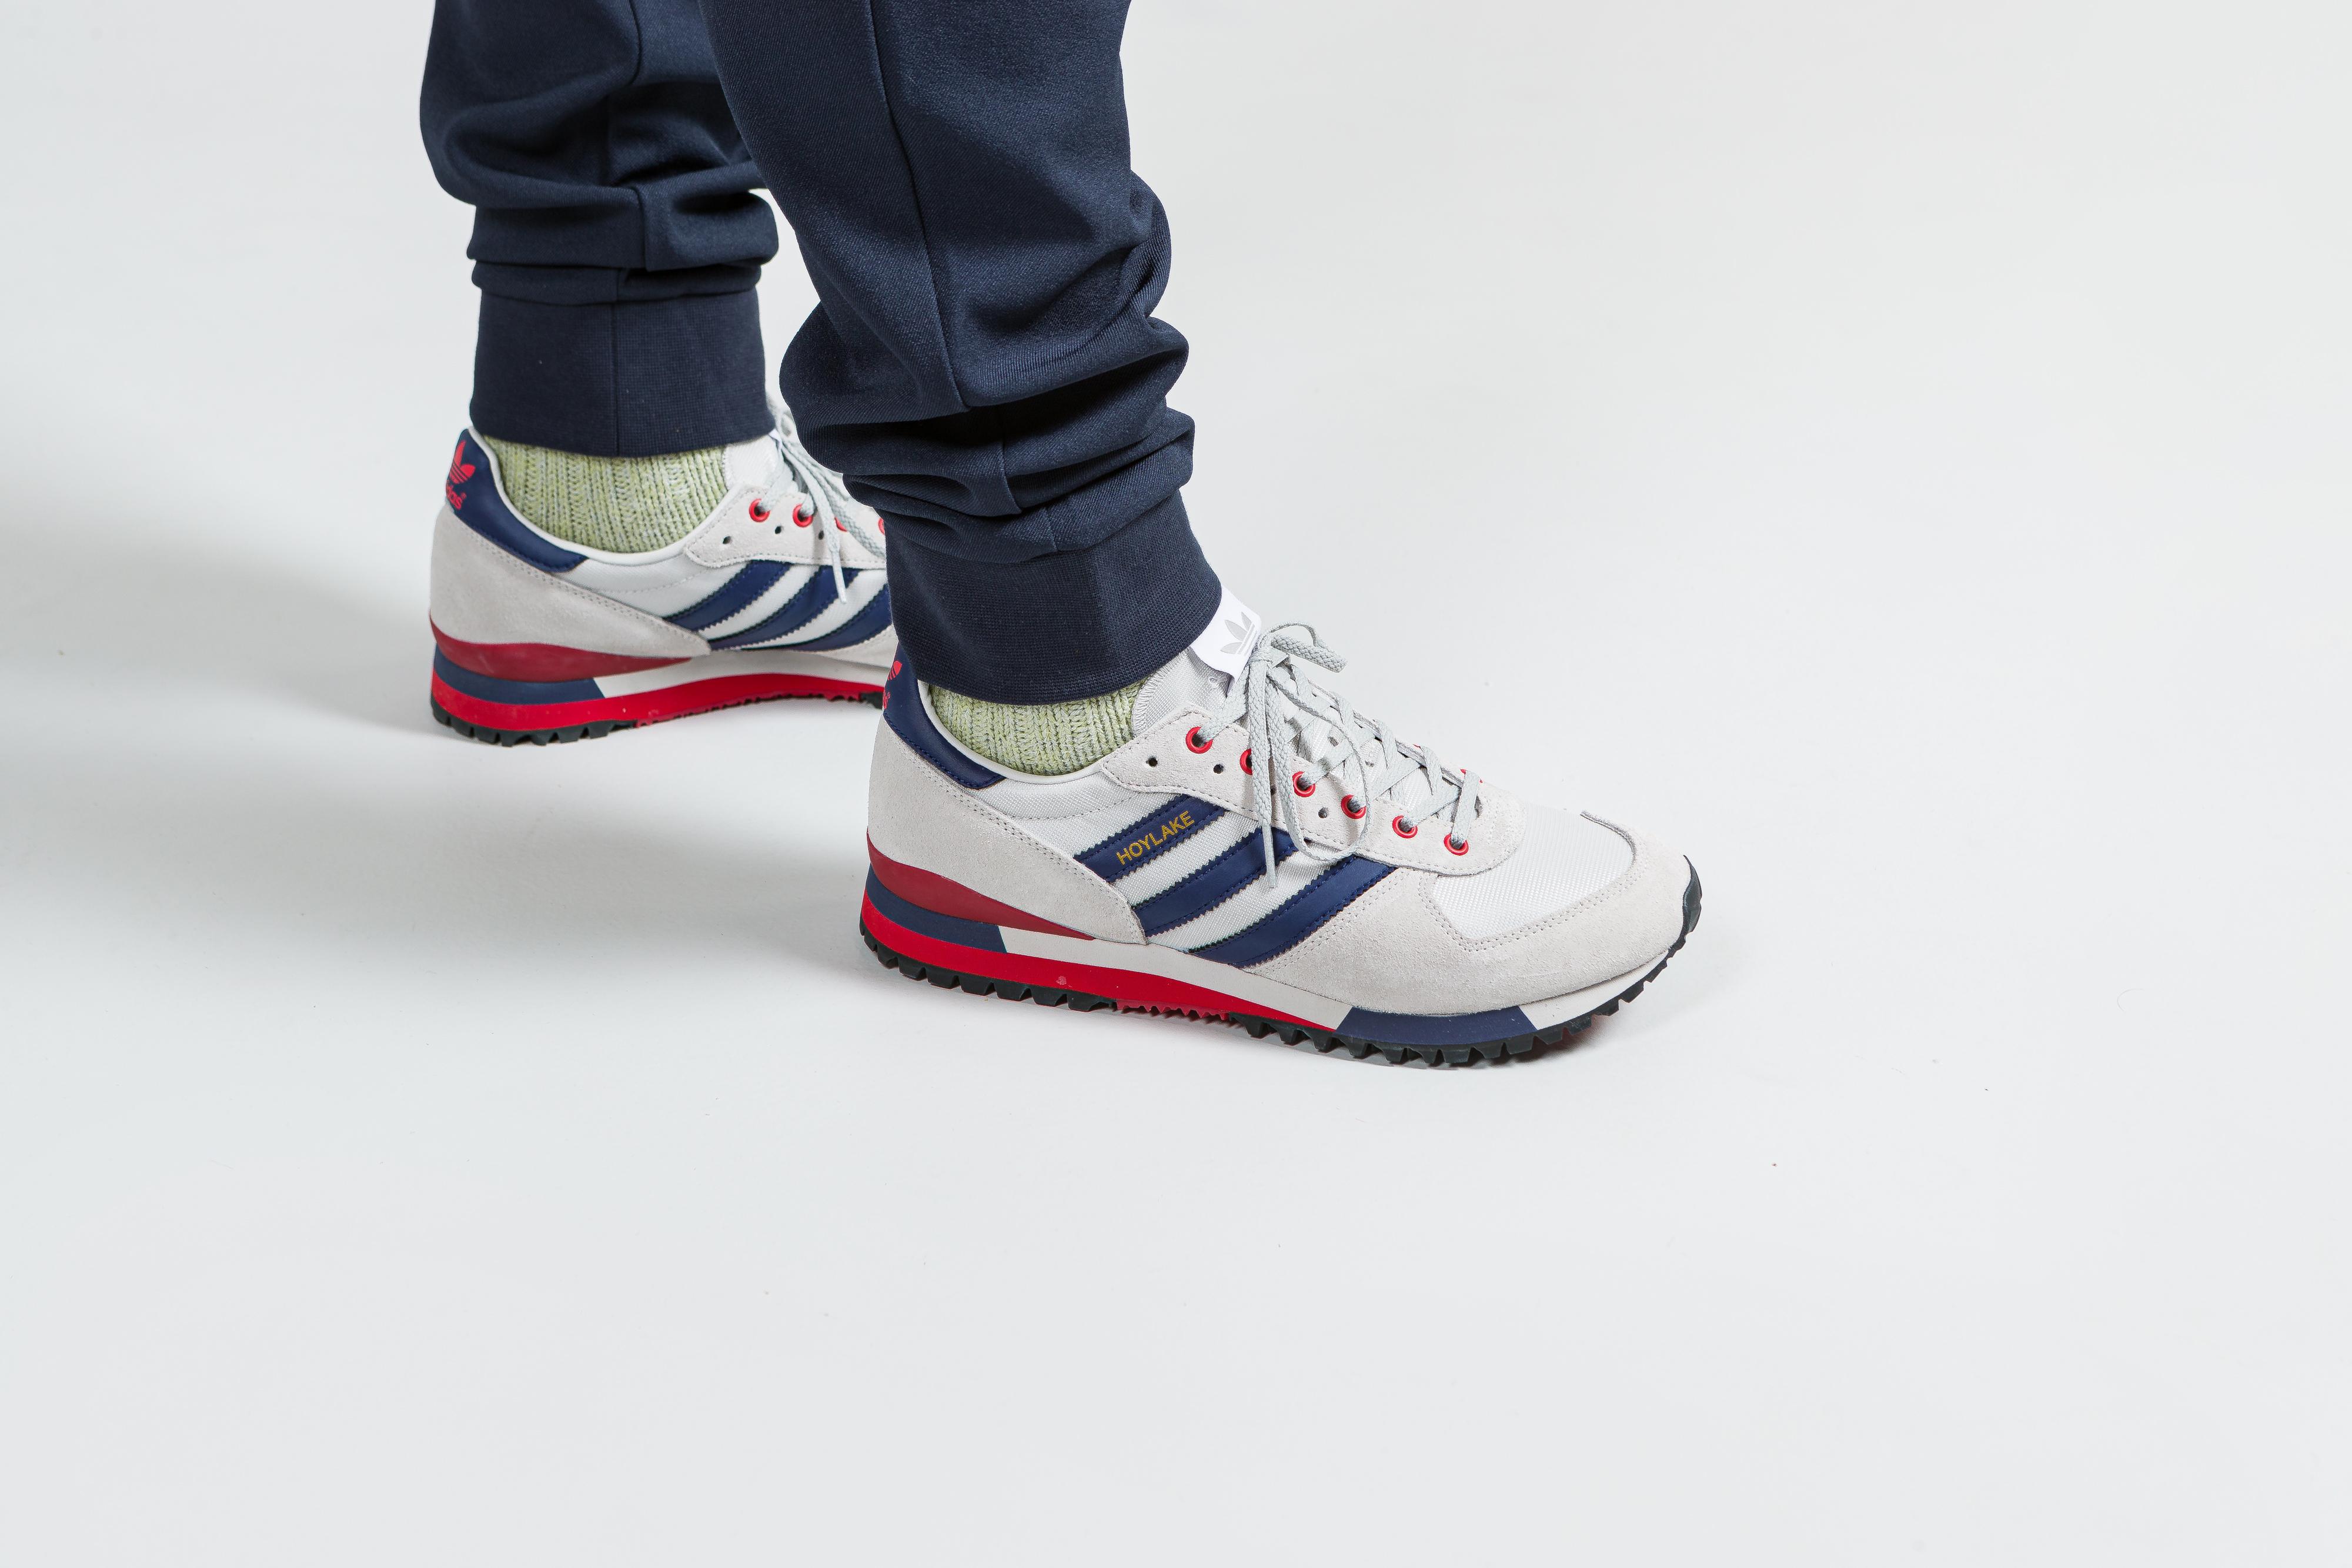 Up There Store - adidas Originals Spezial Collection Spring/Summer 2021 Burnden, Malmo, Marathon 86, Hoylake